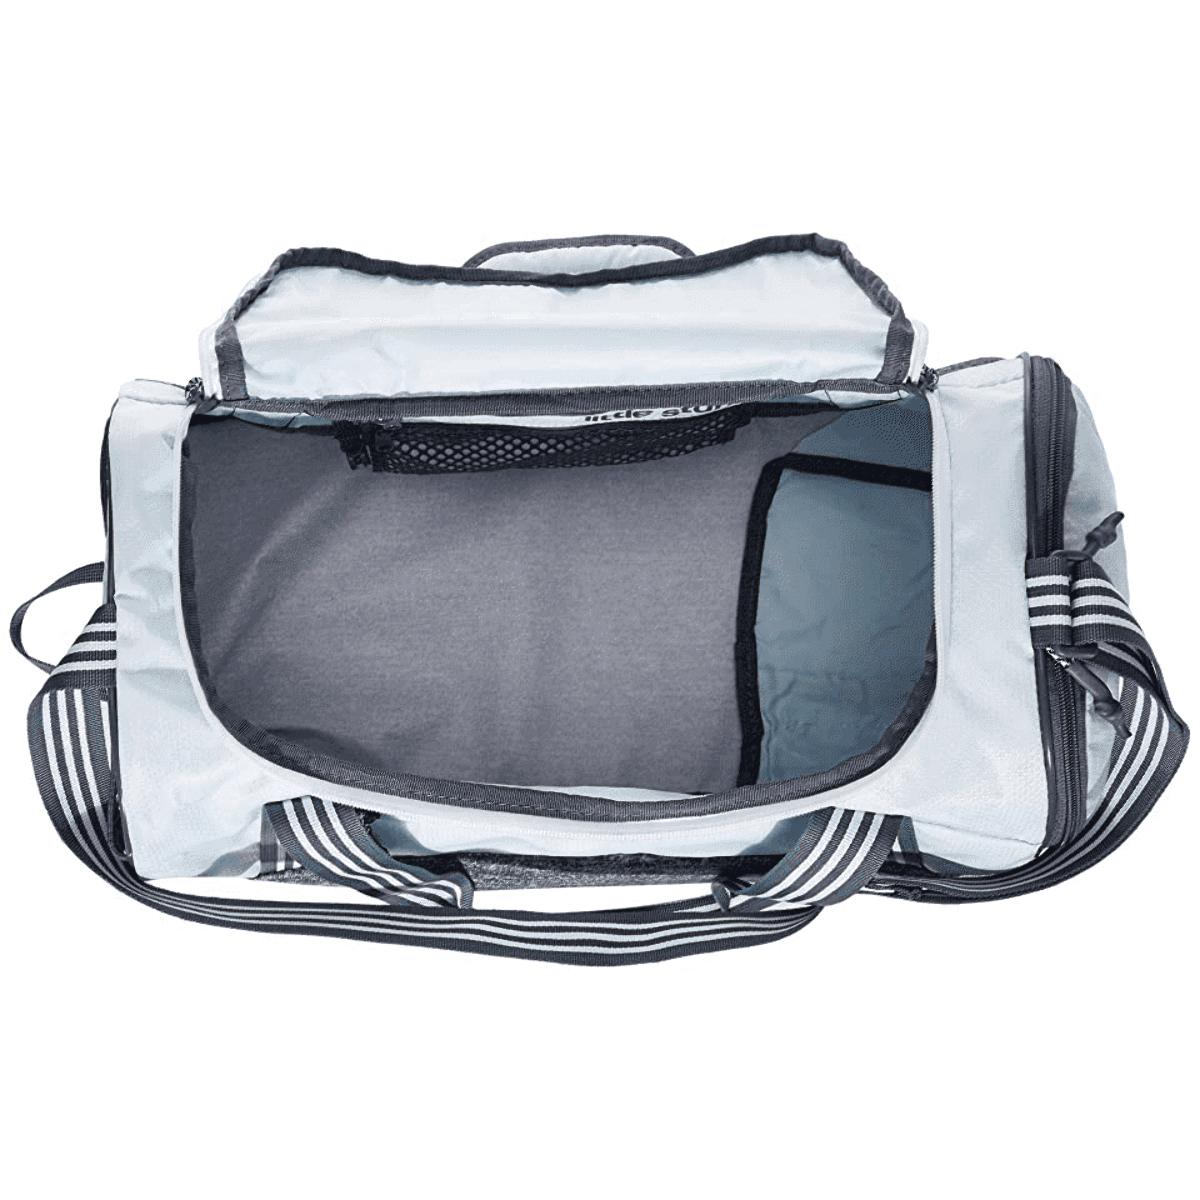 Adidas Squad LV Duffle Bag - Color: Sky Tint Blue/Jersey Onix - Size: One Size, Sky Tint Blue/Jersey Onix, large, image 3